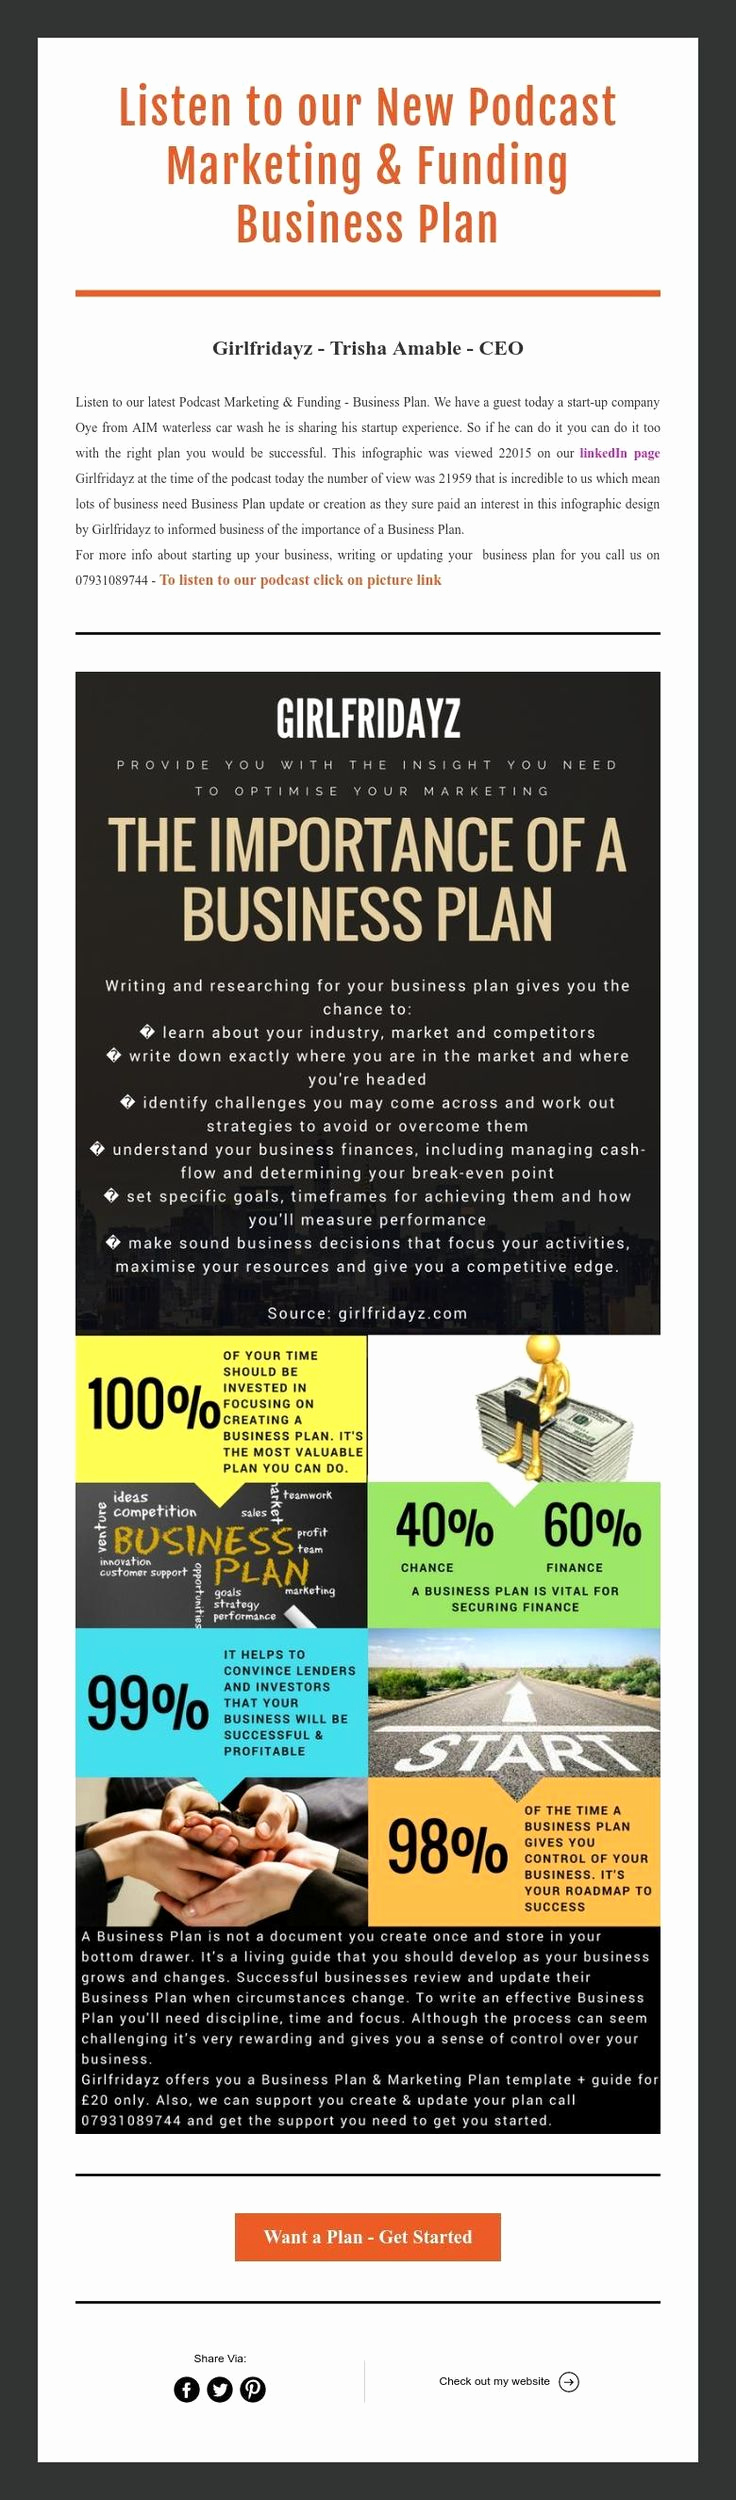 Car Wash Business Plan Fresh 25 Beautiful Car Wash Business Ideas On Pinterest